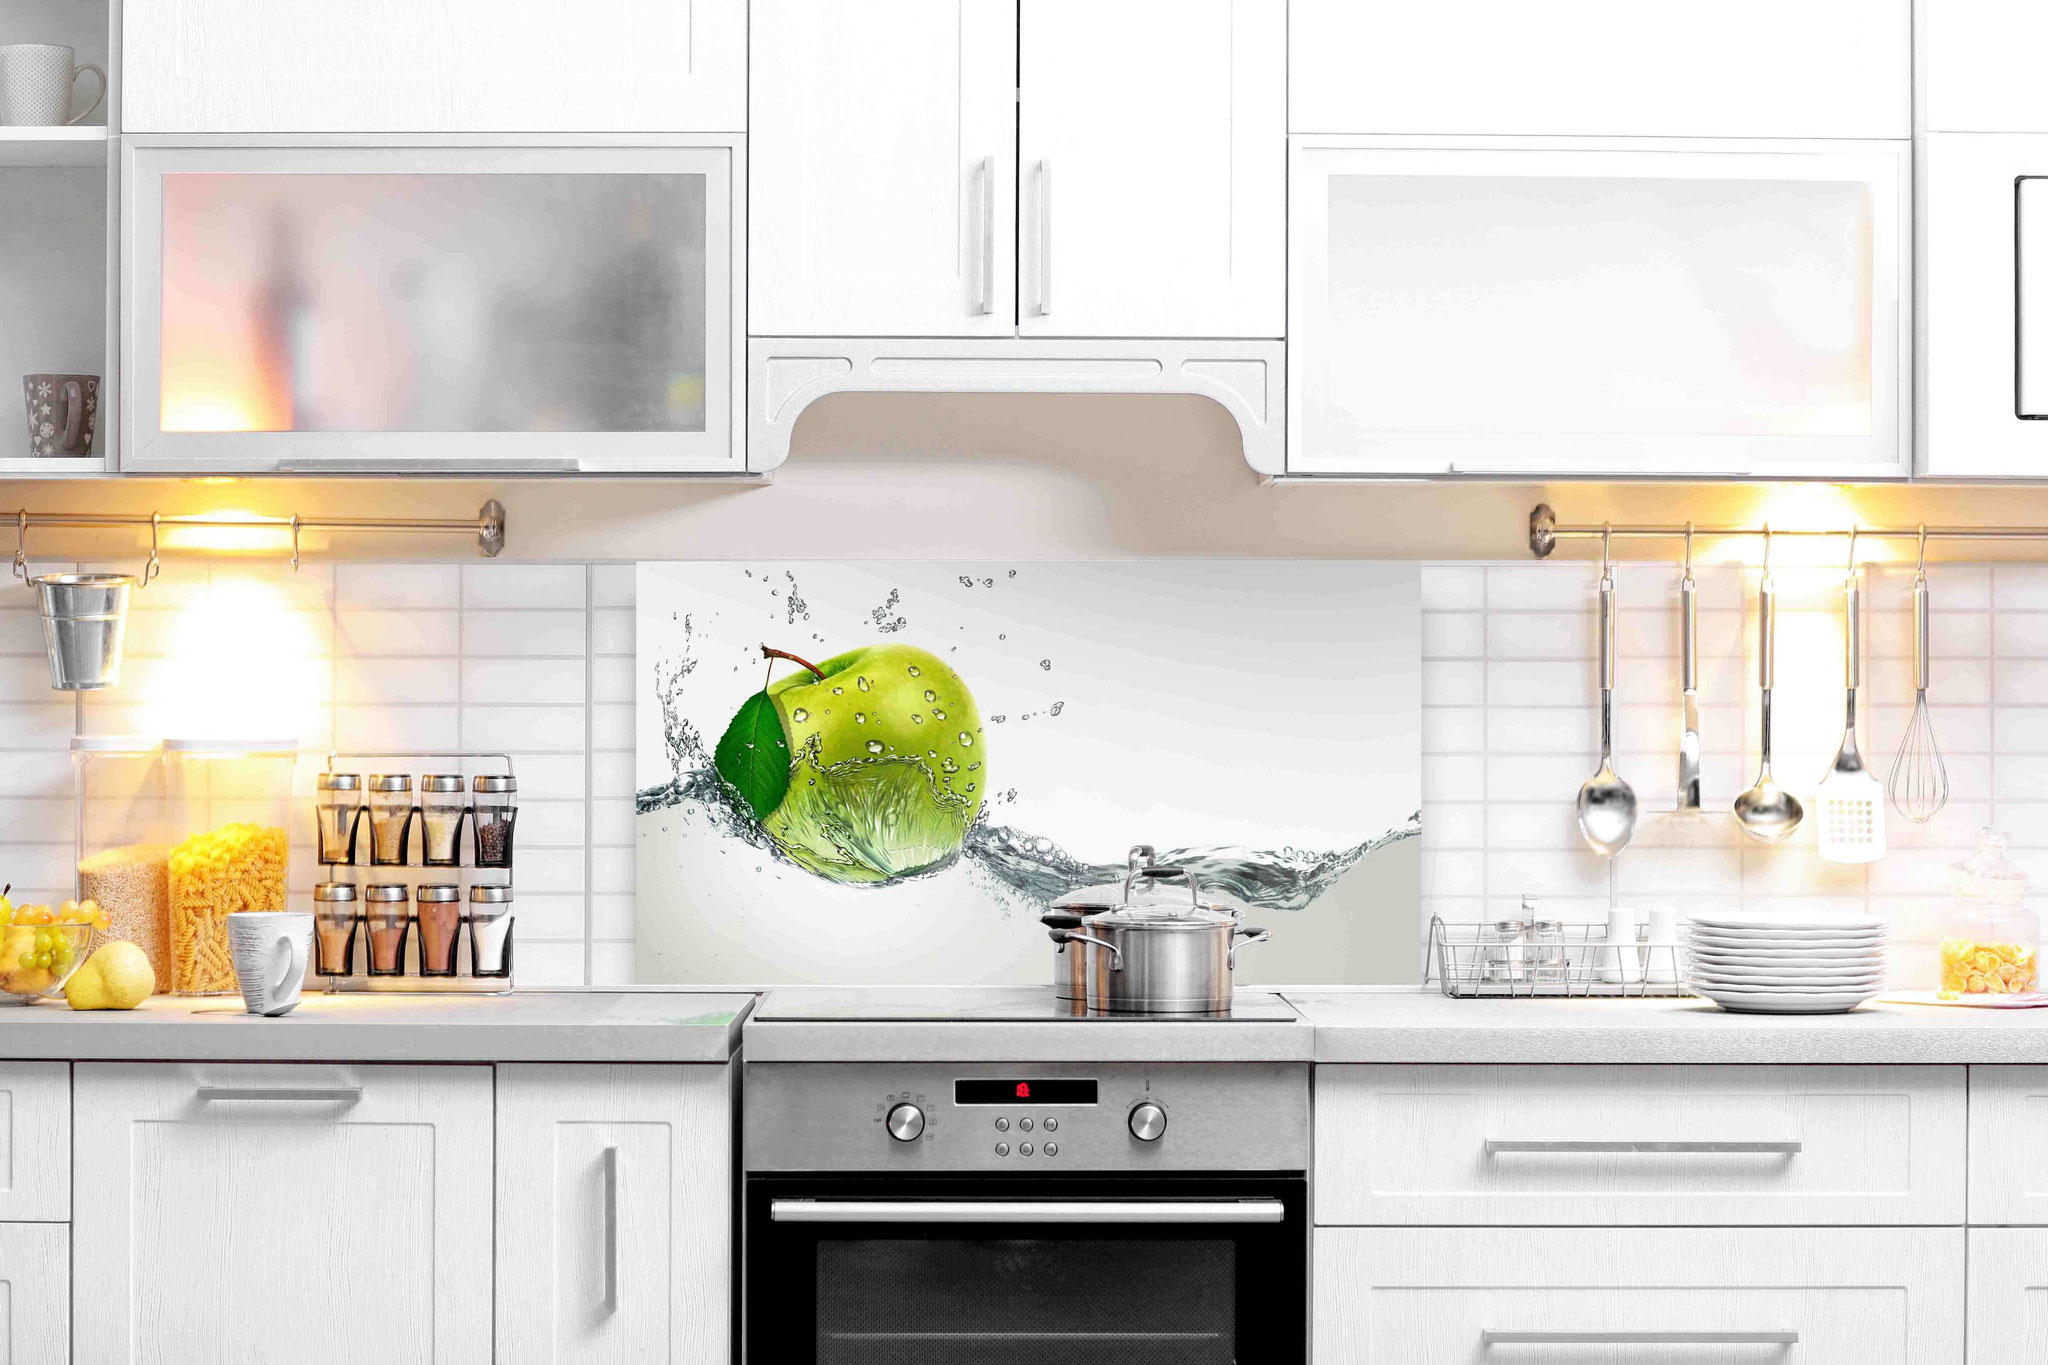 Kuche Glaswand Motive Moderne Glas Kuchenruckwand Designs Bieten